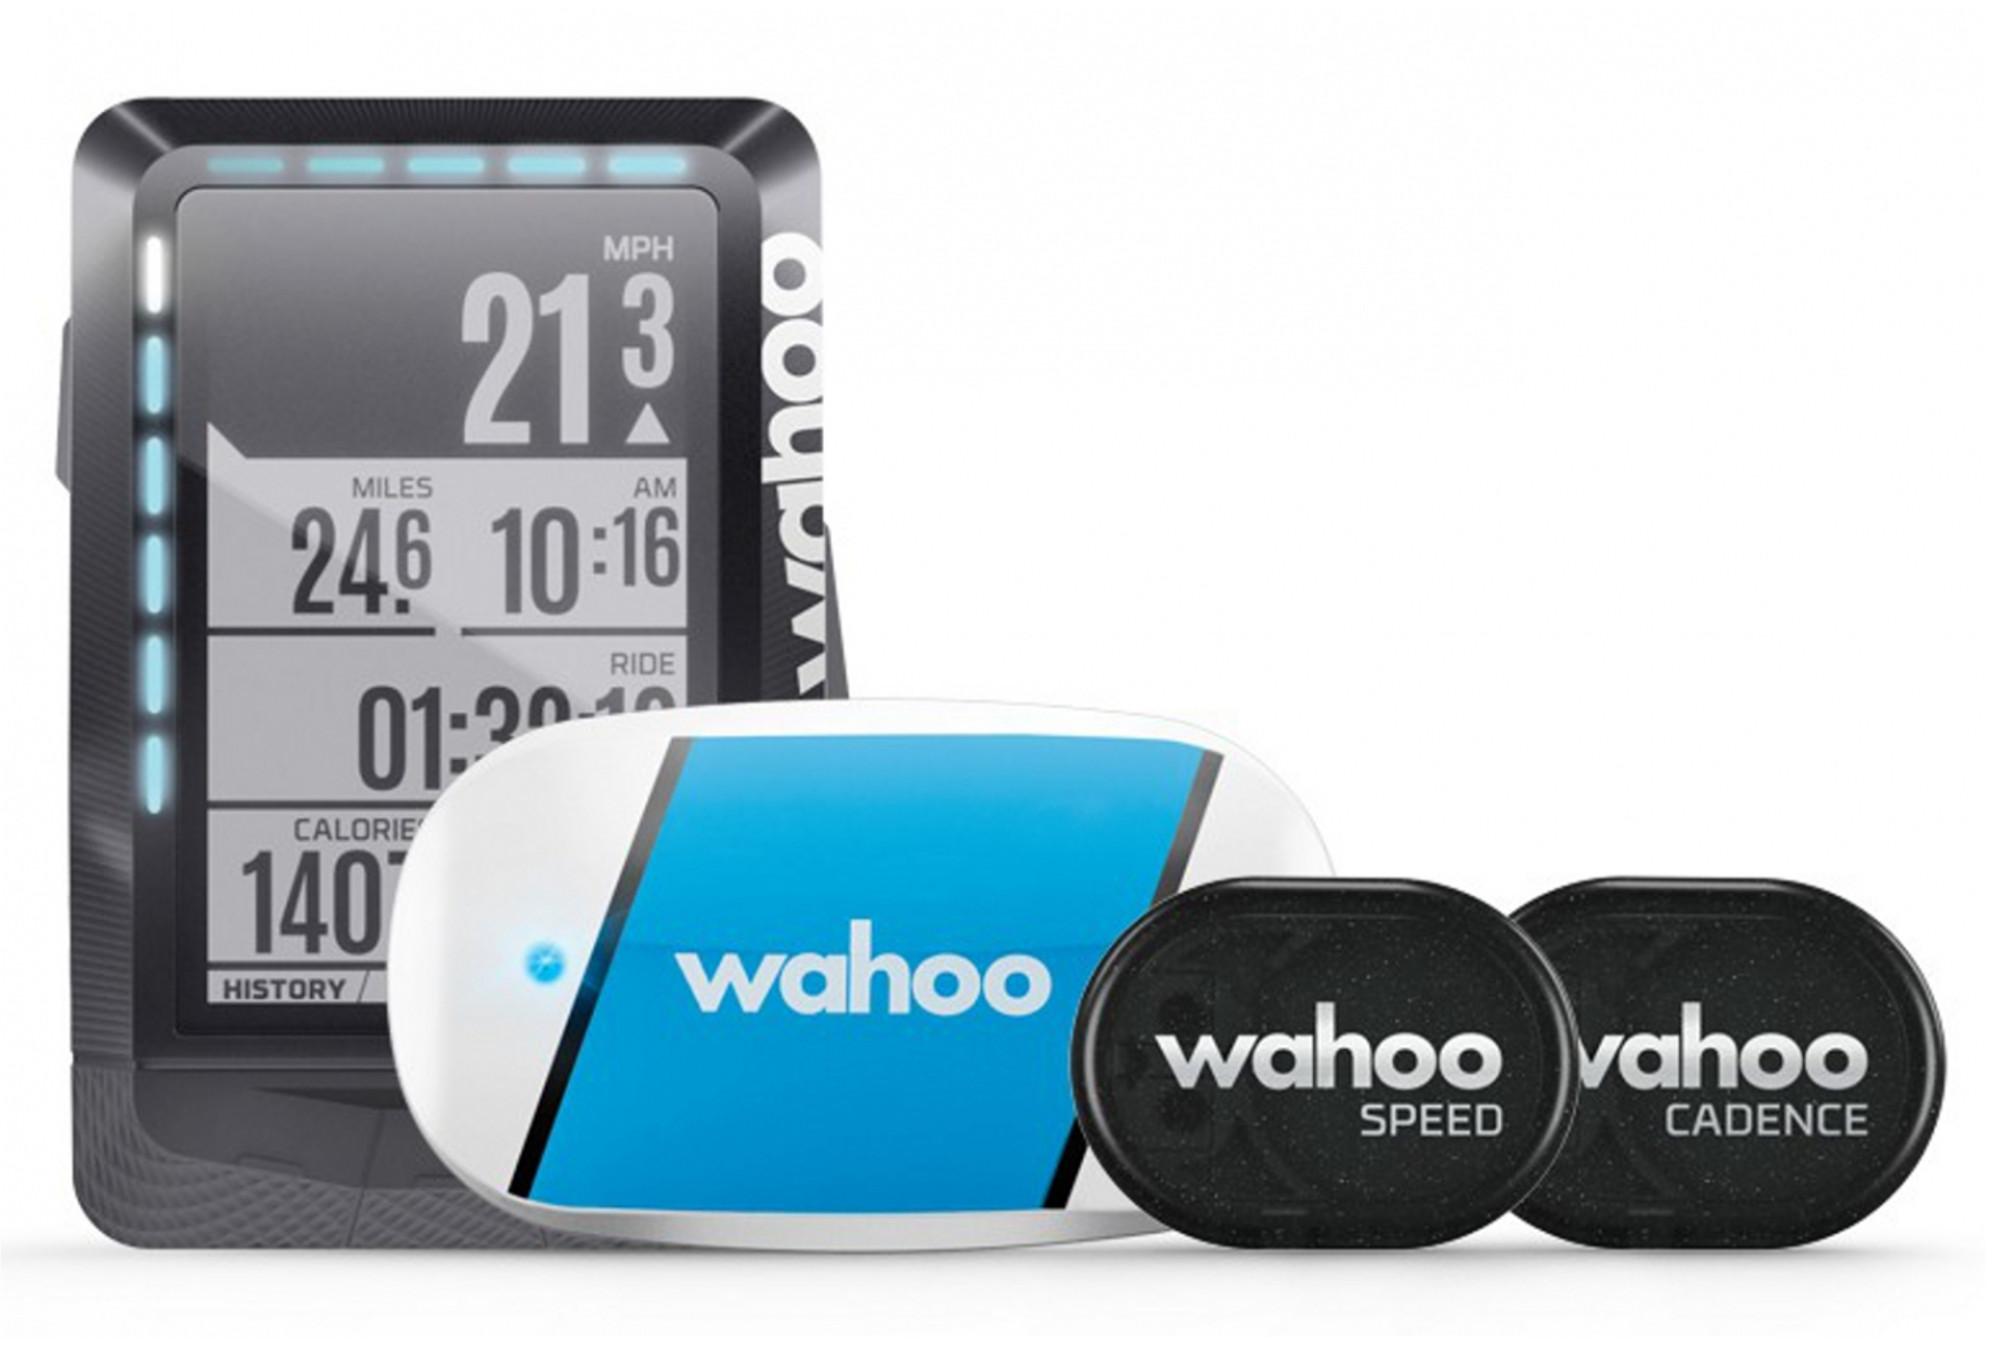 compteur gps wahoo fitness pack ceinture cardio capteurs. Black Bedroom Furniture Sets. Home Design Ideas